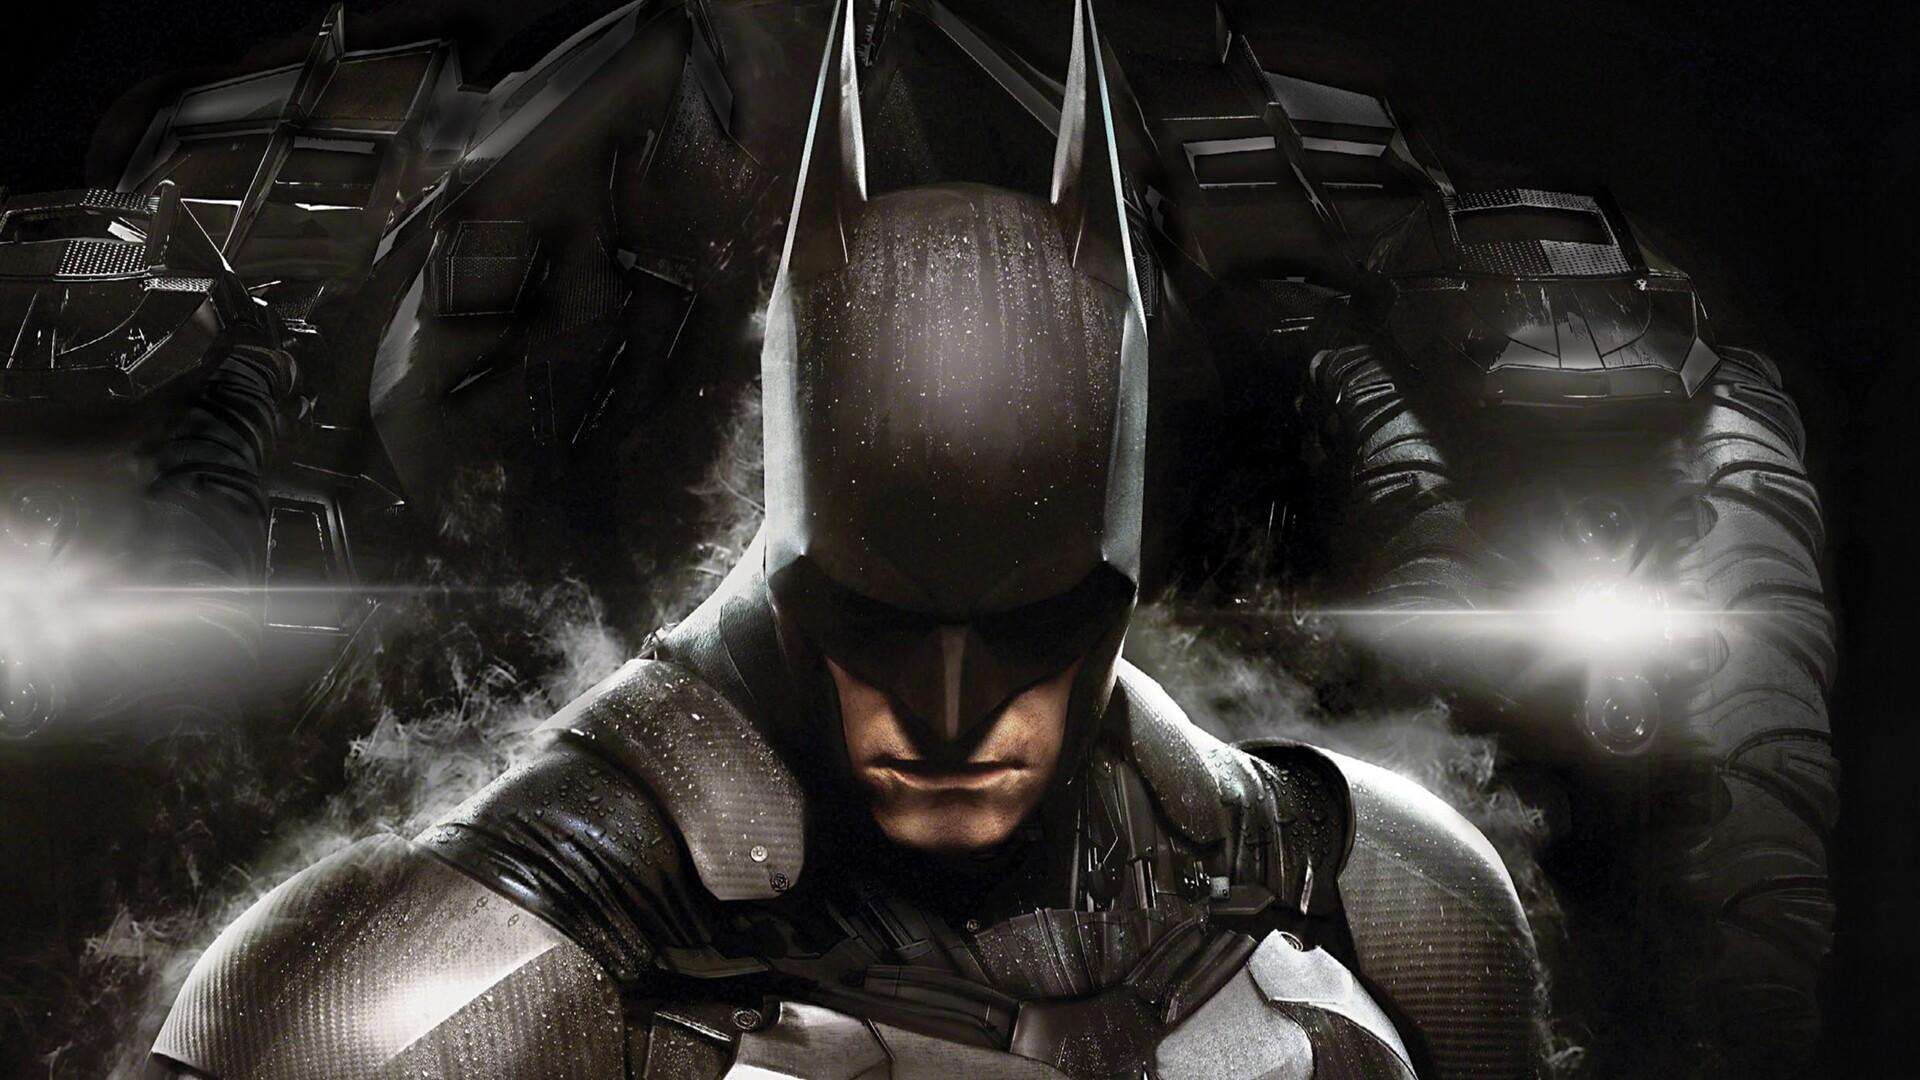 download batman arkham knight full hd hd 4k wallpapers in